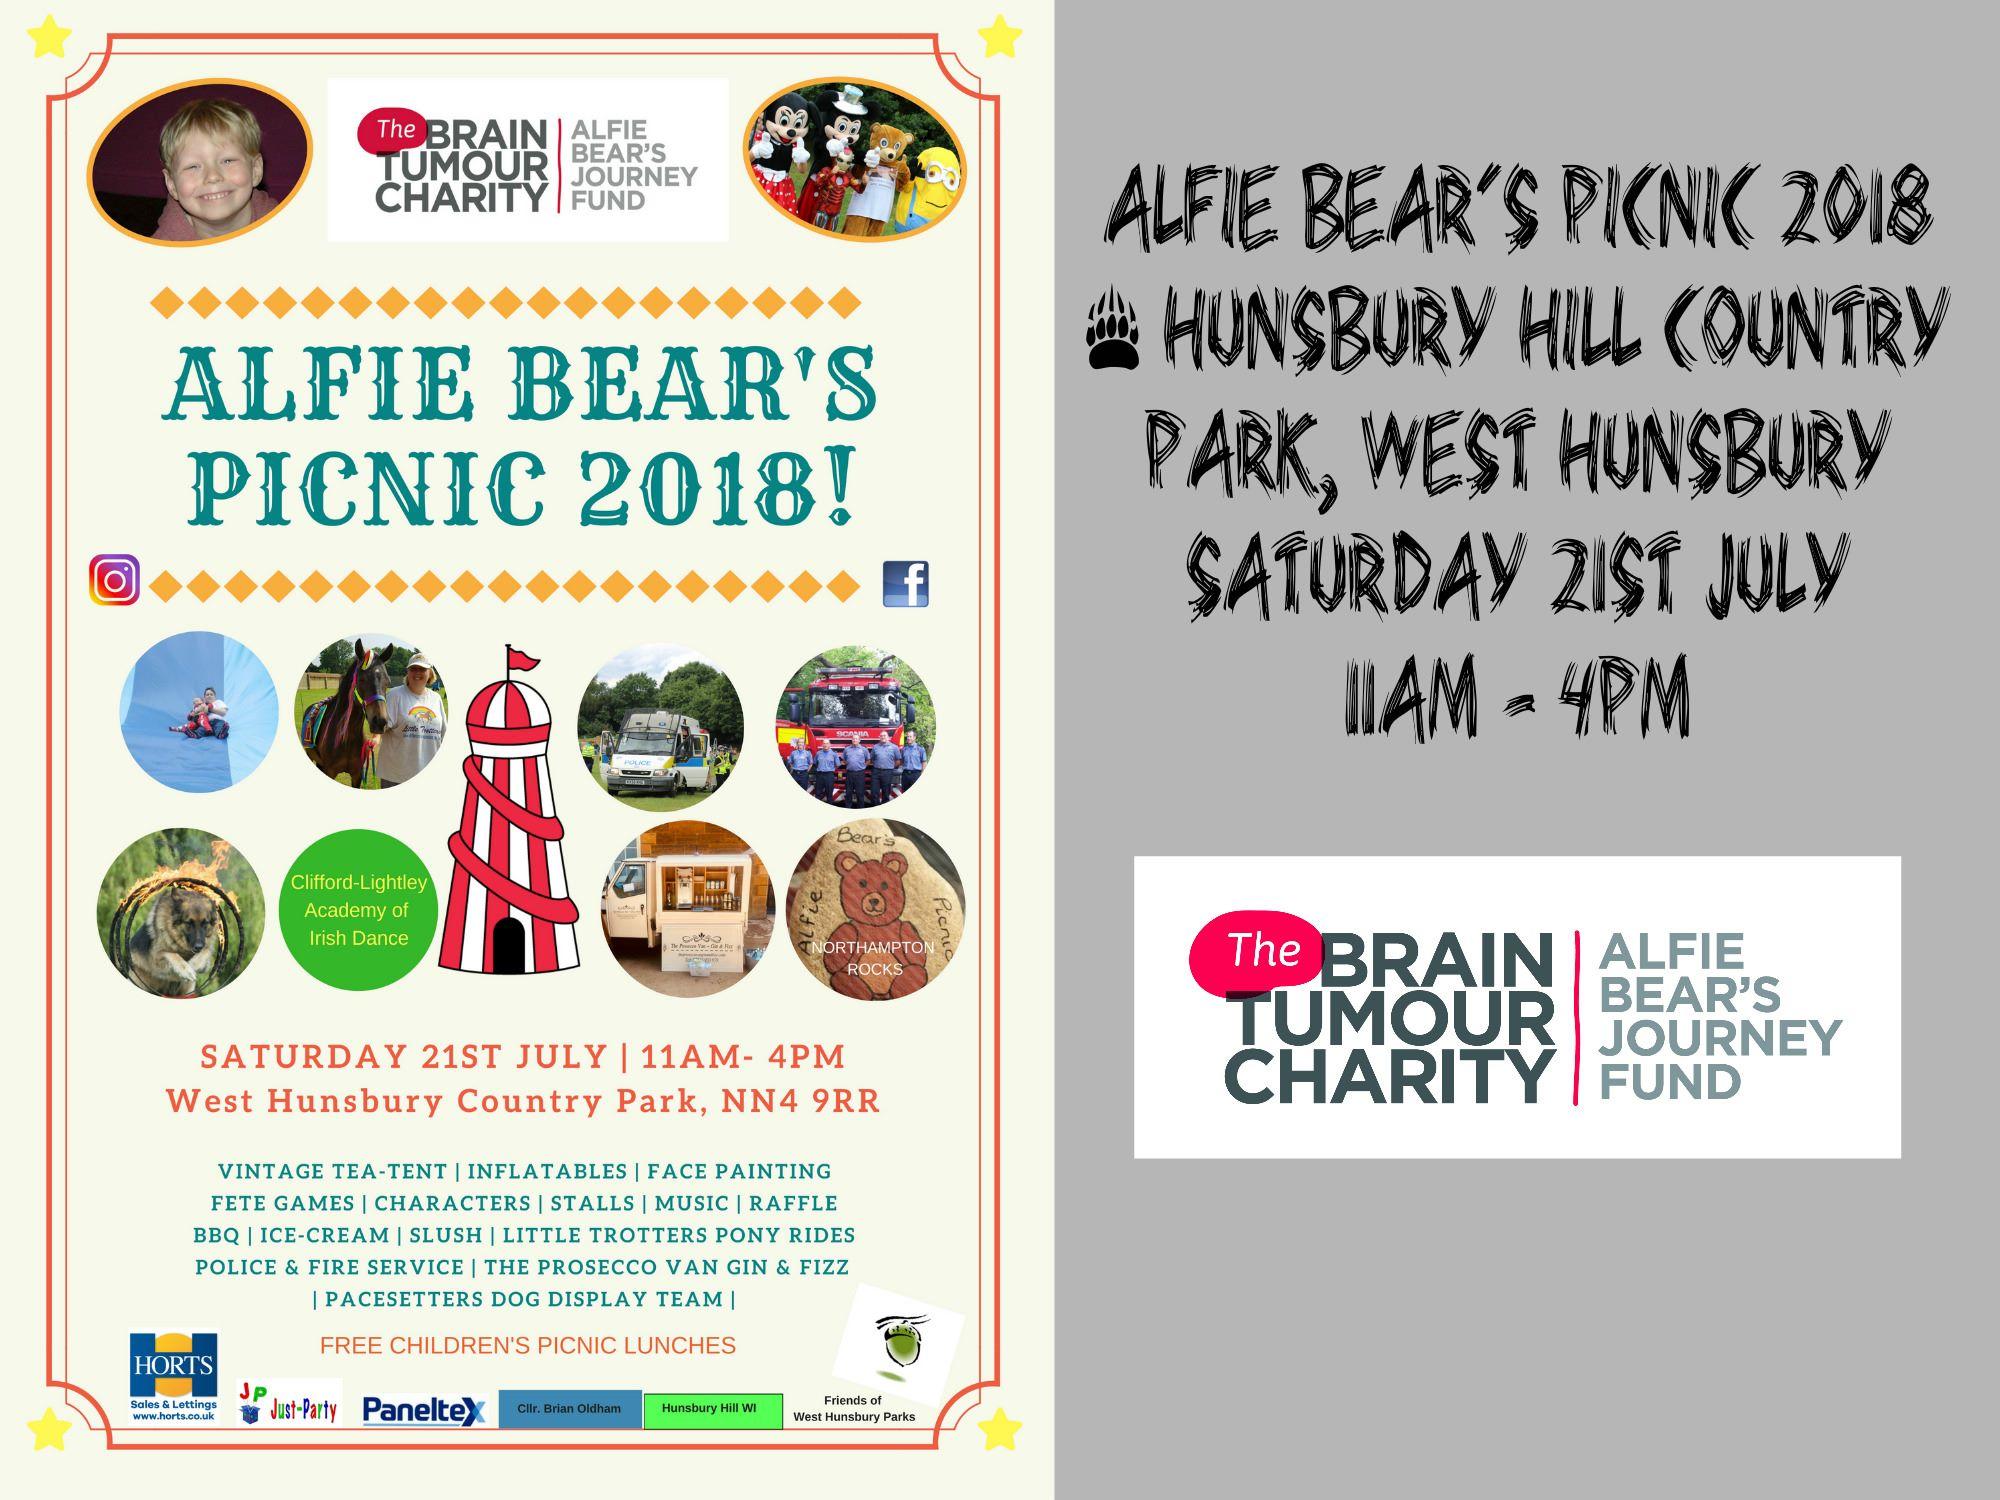 Alfie Bear's Picnic 2018